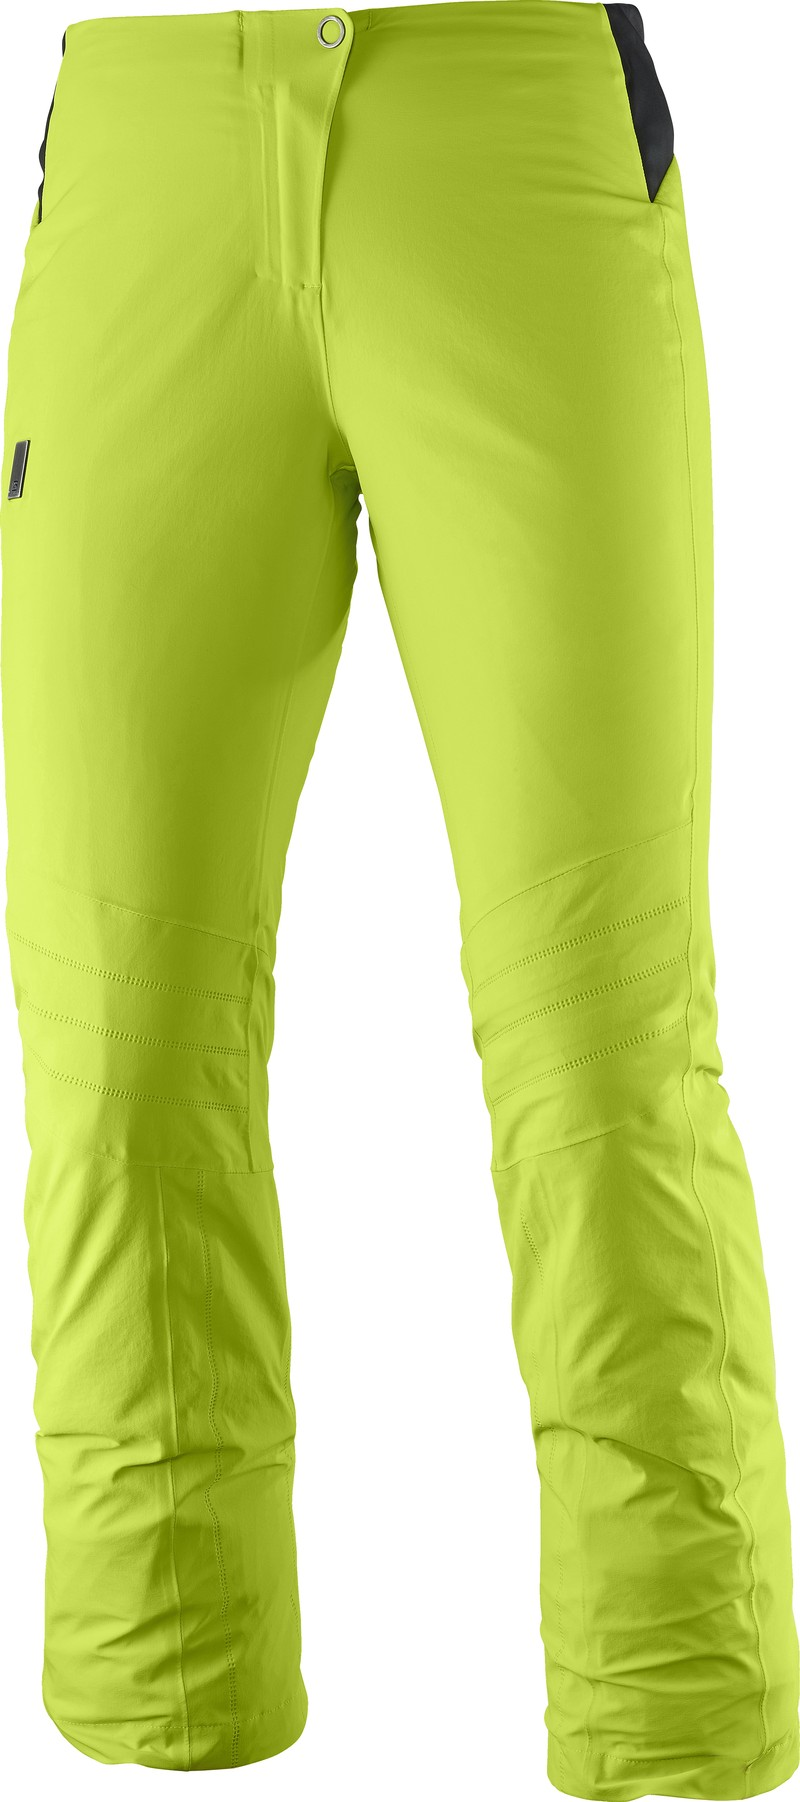 Salomon - Whitelight Pant W - Ski pants - Women's